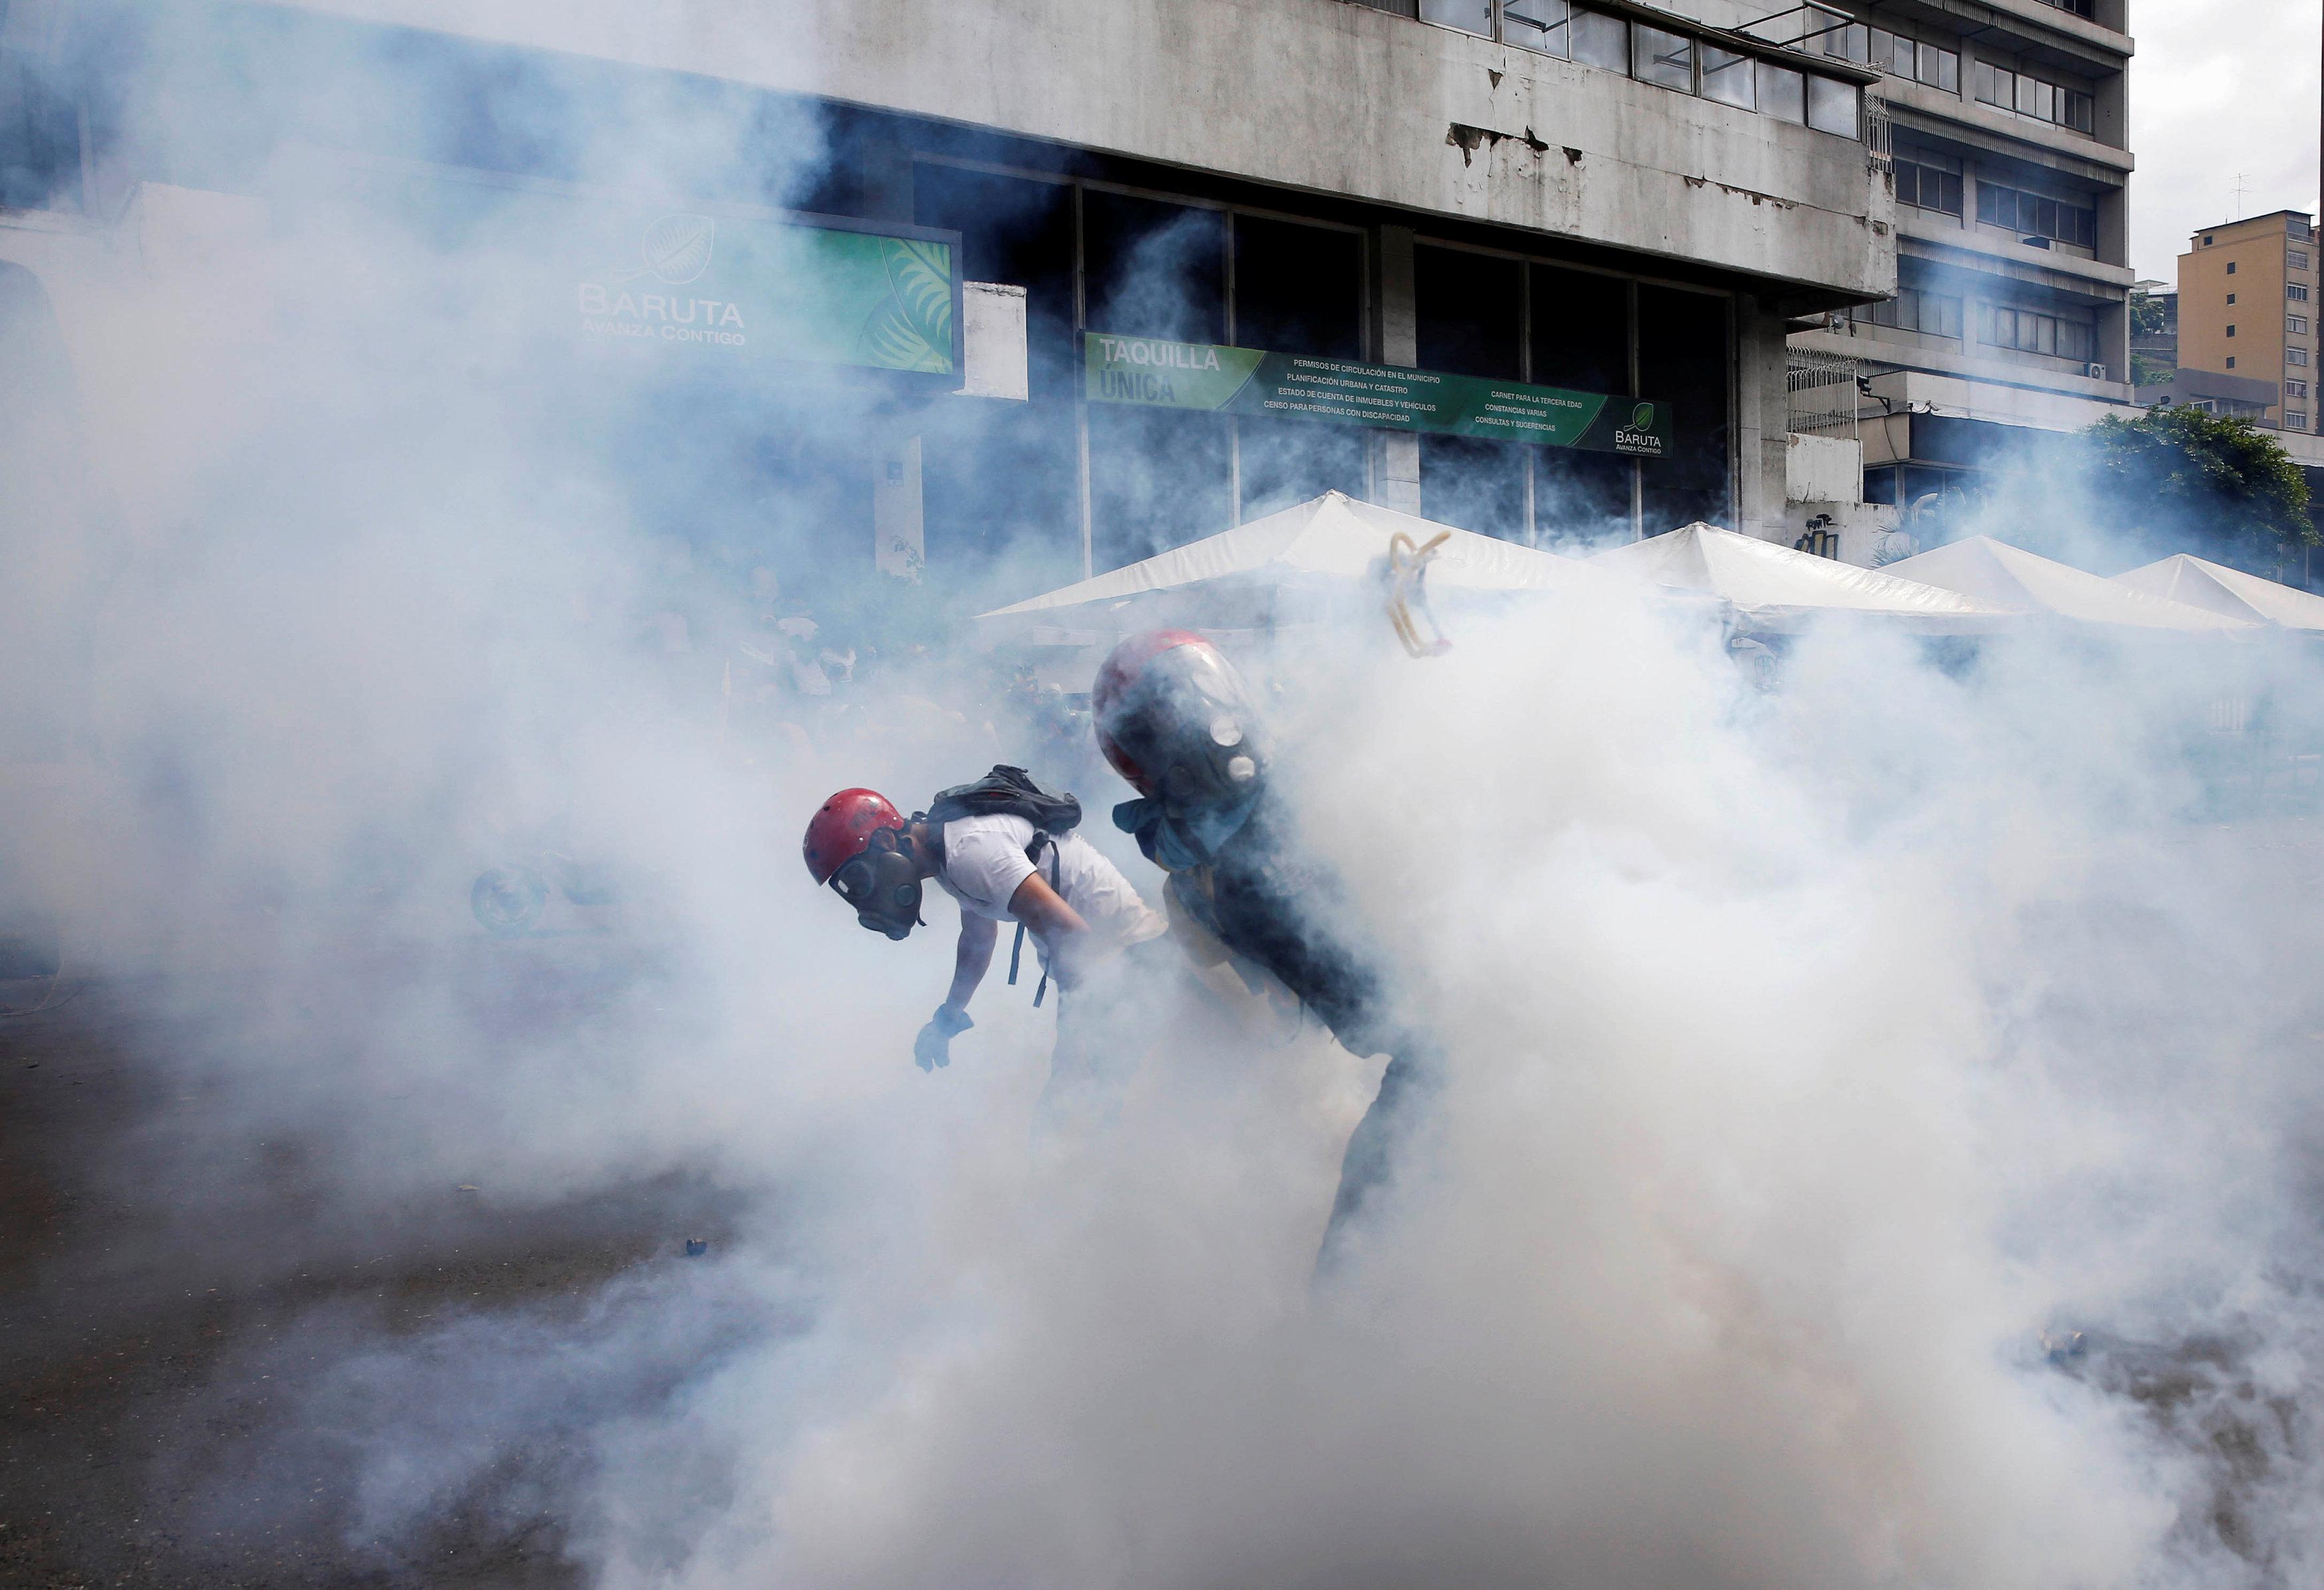 Demonstrators clash with riot security forces while rallying against Venezuela's President Nicolas Maduro in Caracas, Venezuela, June 10, 2017. REUTERS/Ivan Alvarado